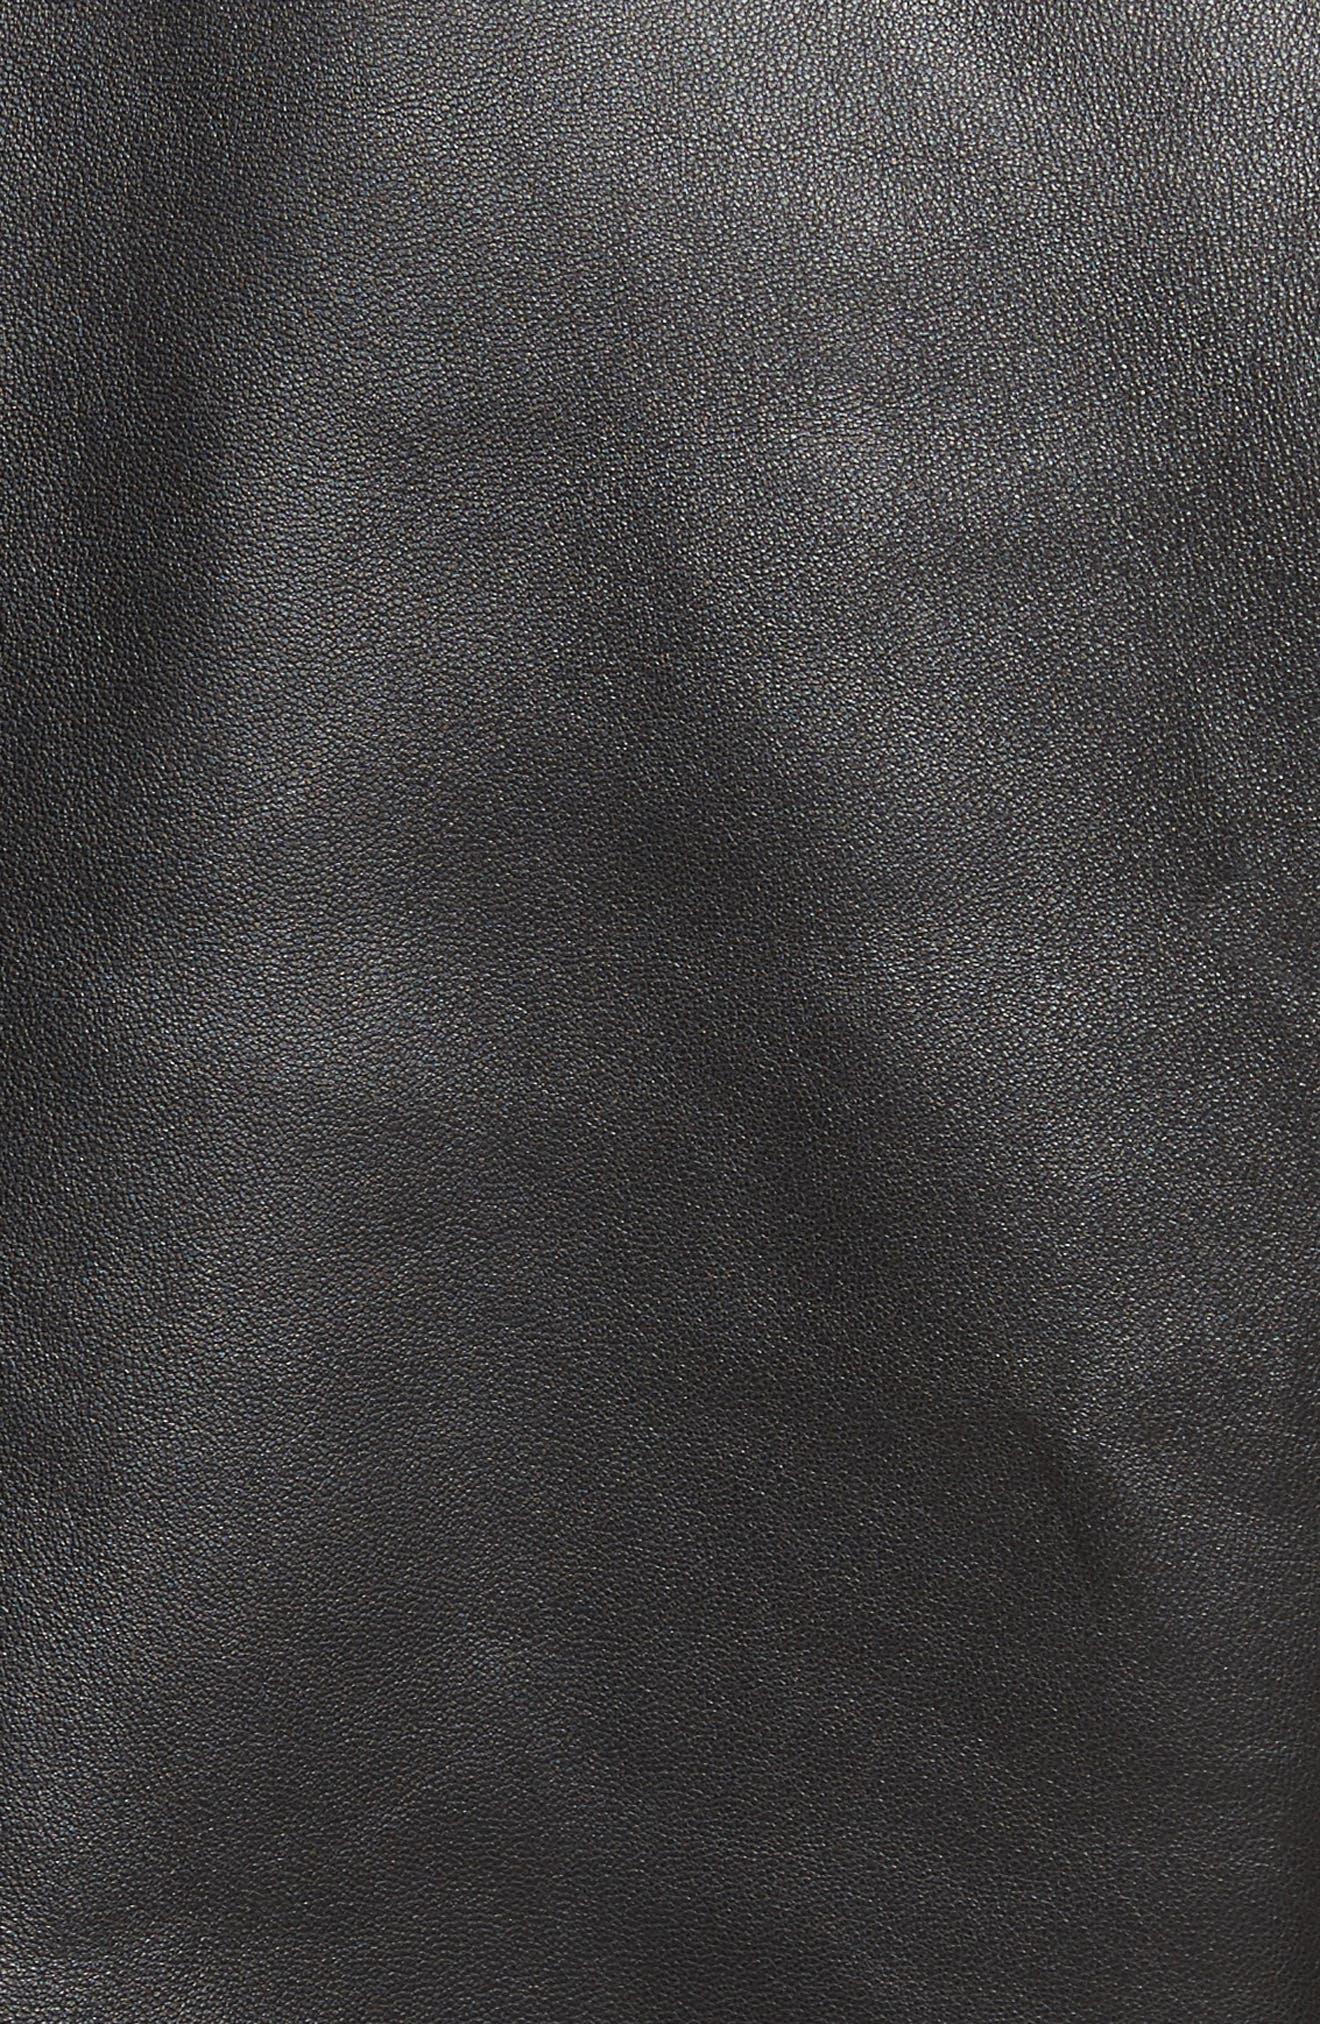 Leather Bomber Jacket,                             Alternate thumbnail 5, color,                             Black